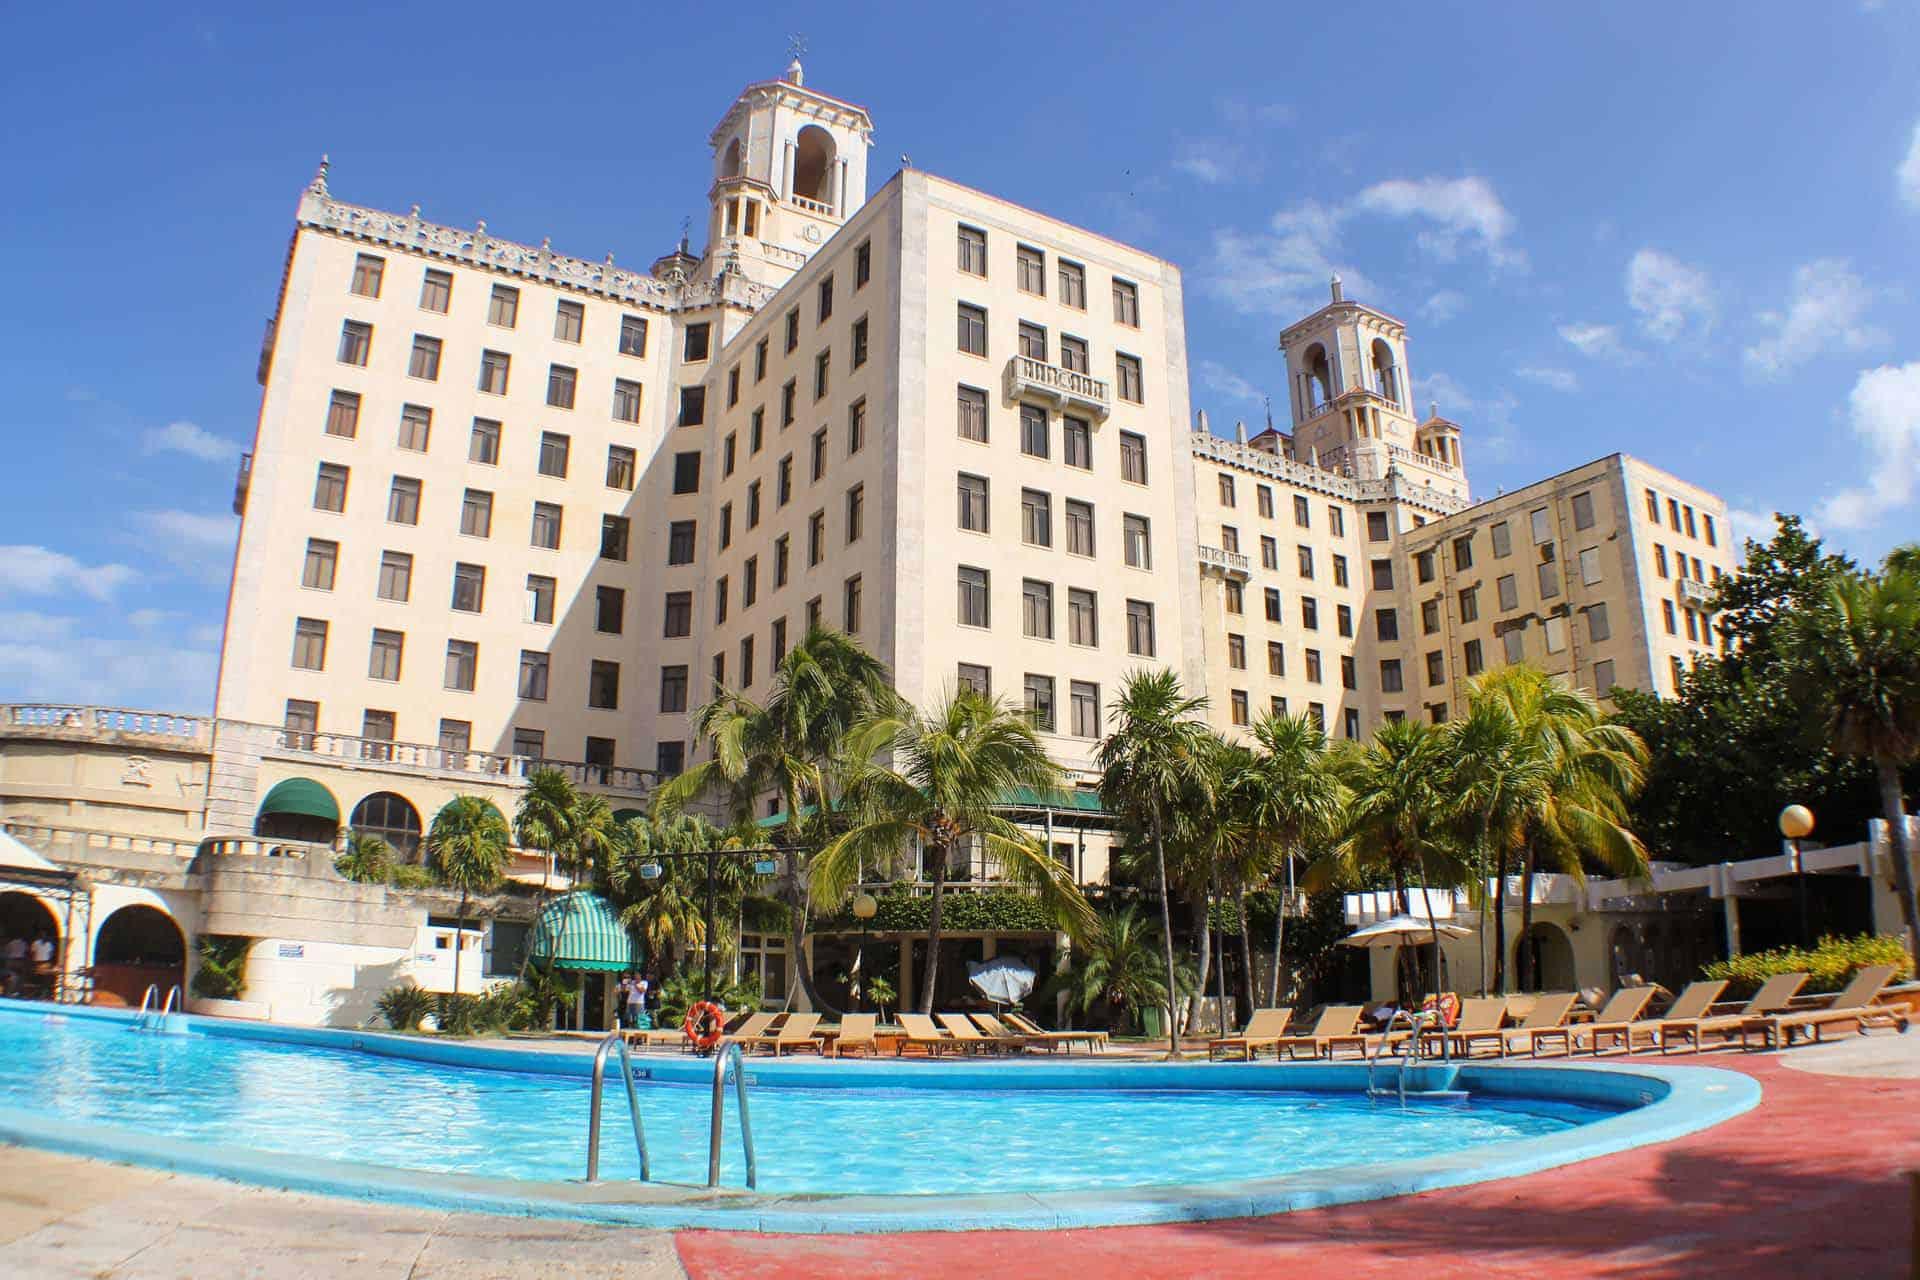 H3061 Hotel Nacional 01 cuba autrement